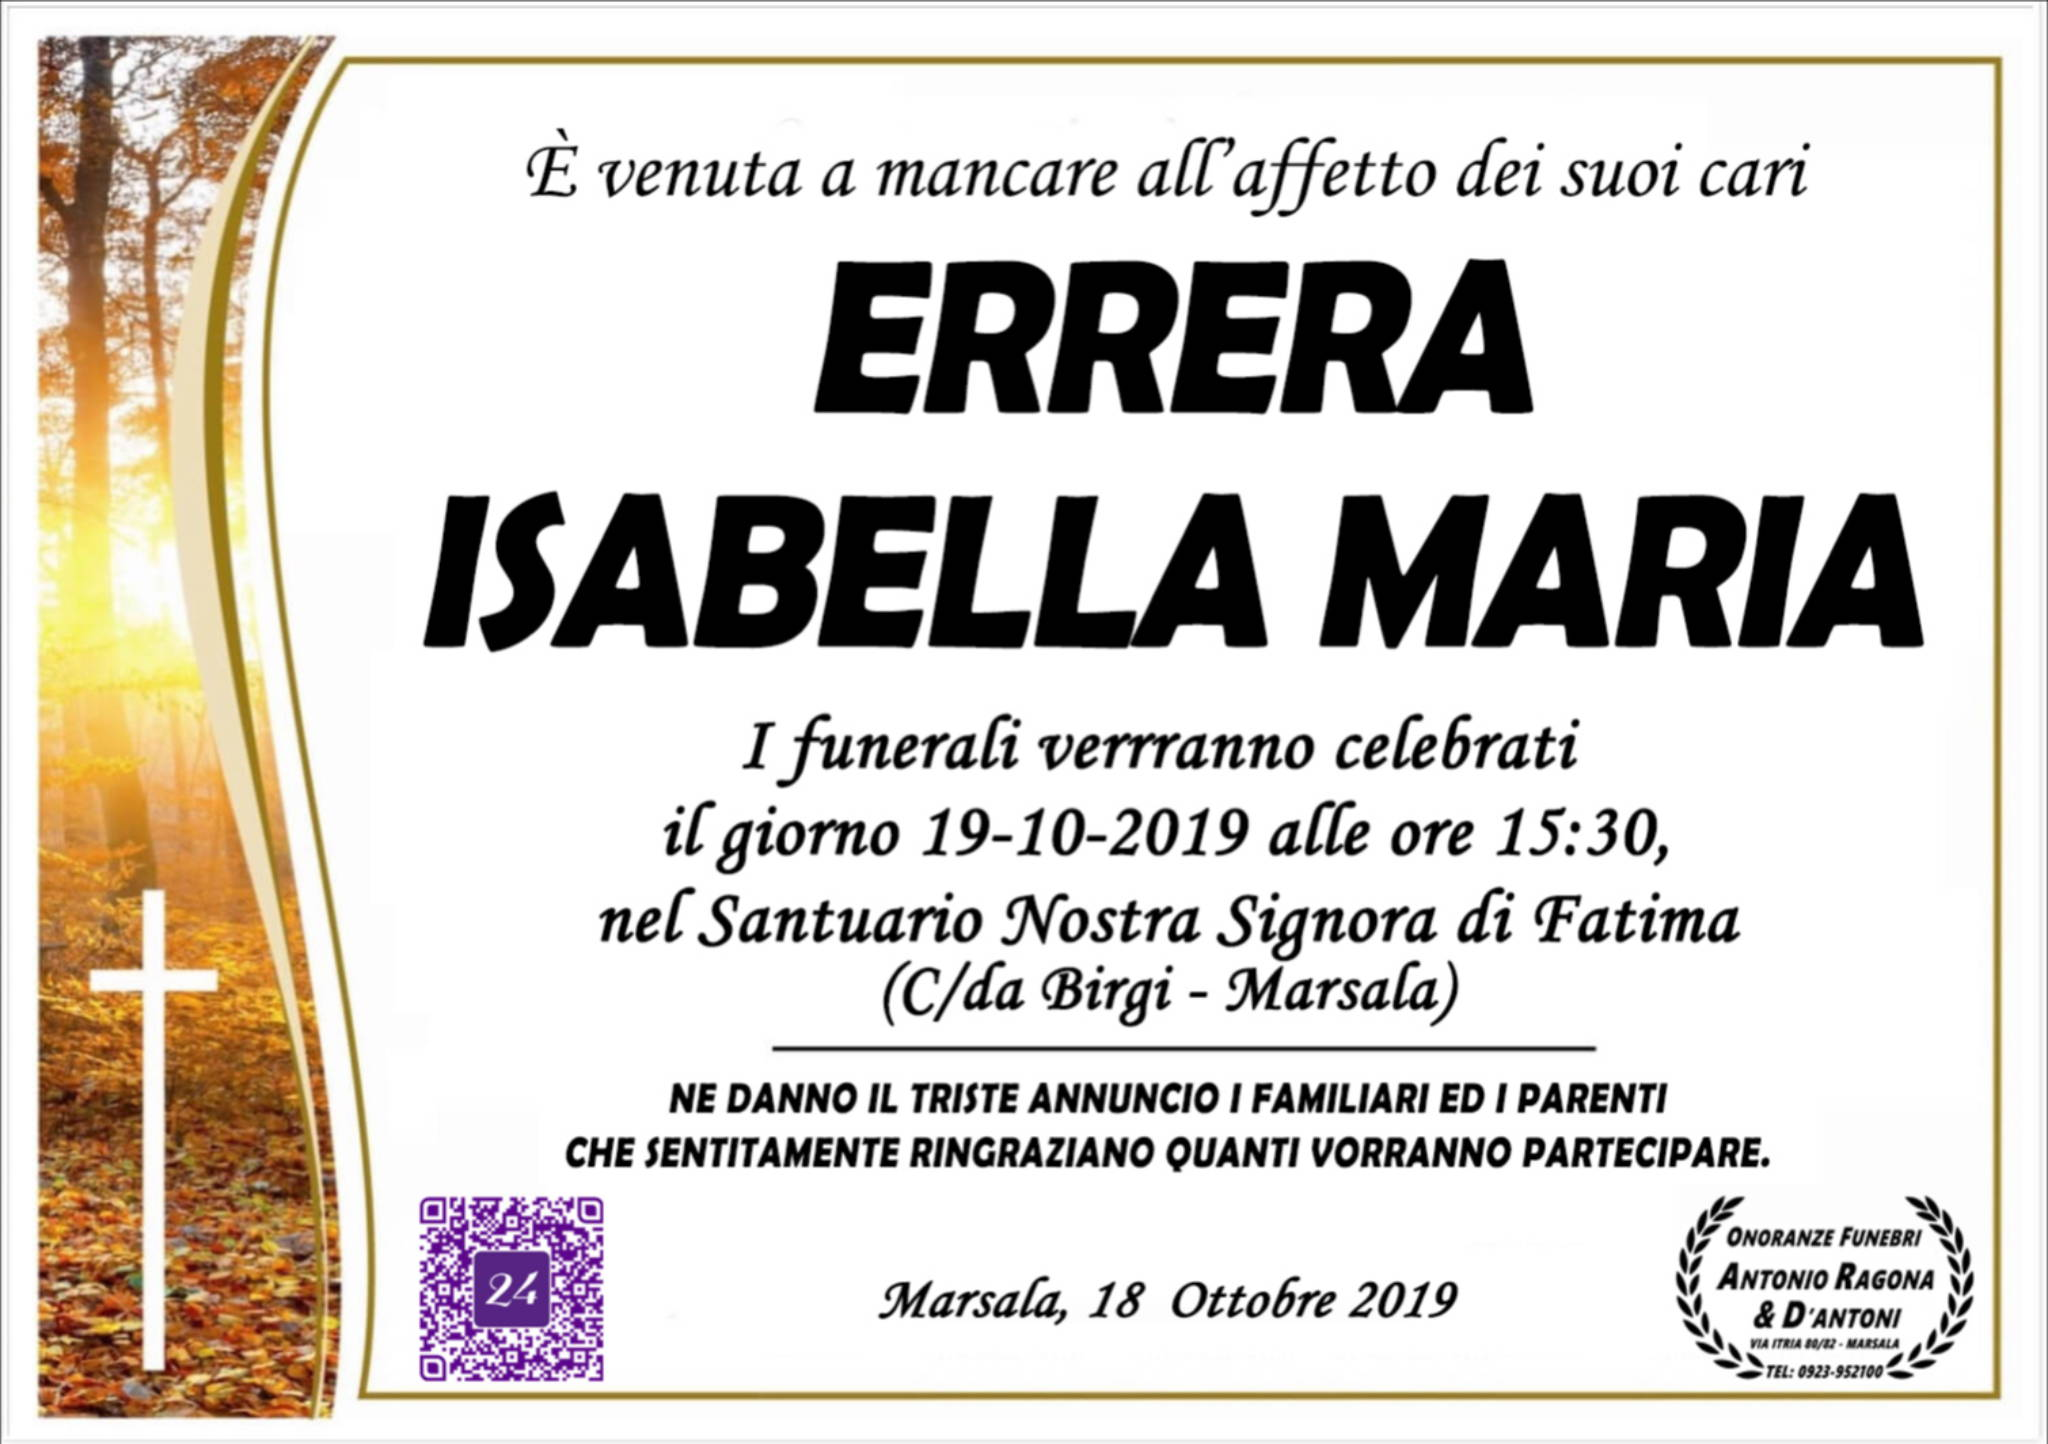 Isabella Maria Errera